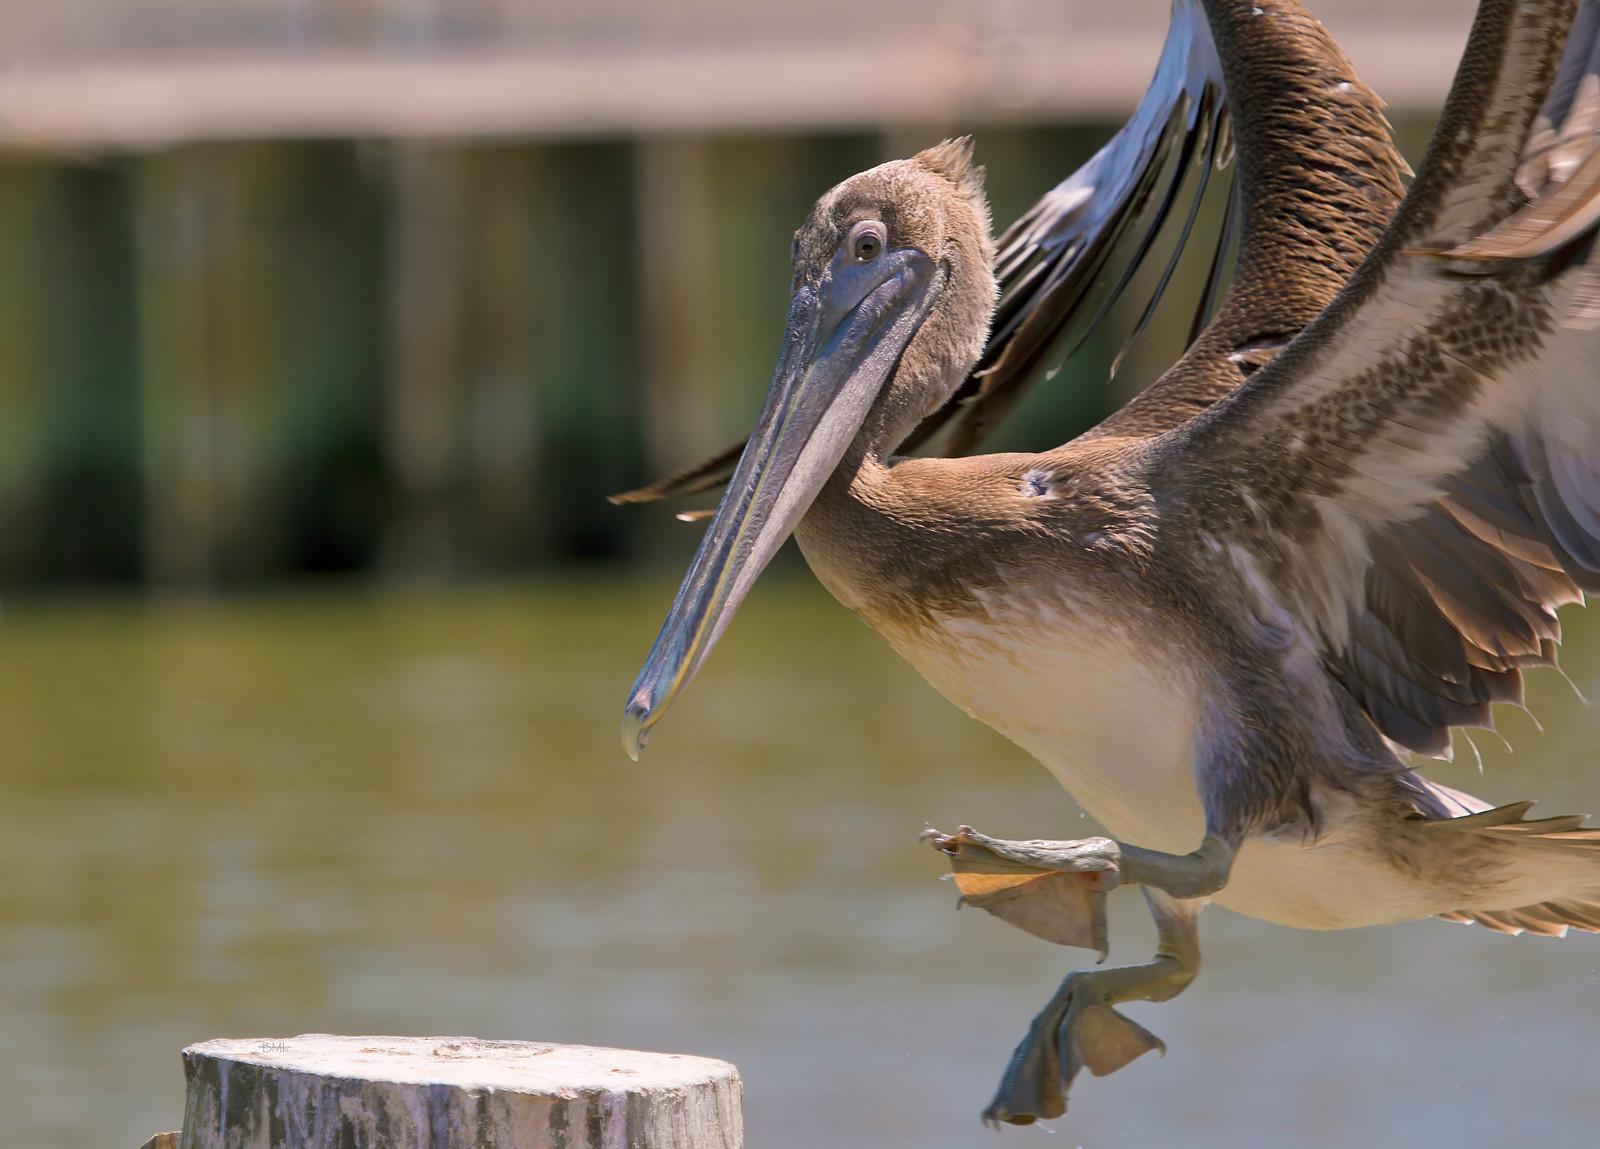 IMAGE: https://photos.smugmug.com/Beautyinthetreesandintheair/Swimming-birds/i-zXzFx6q/2/8e816e3e/X3/Pelican%20San%20Leon_2014-X3.jpg